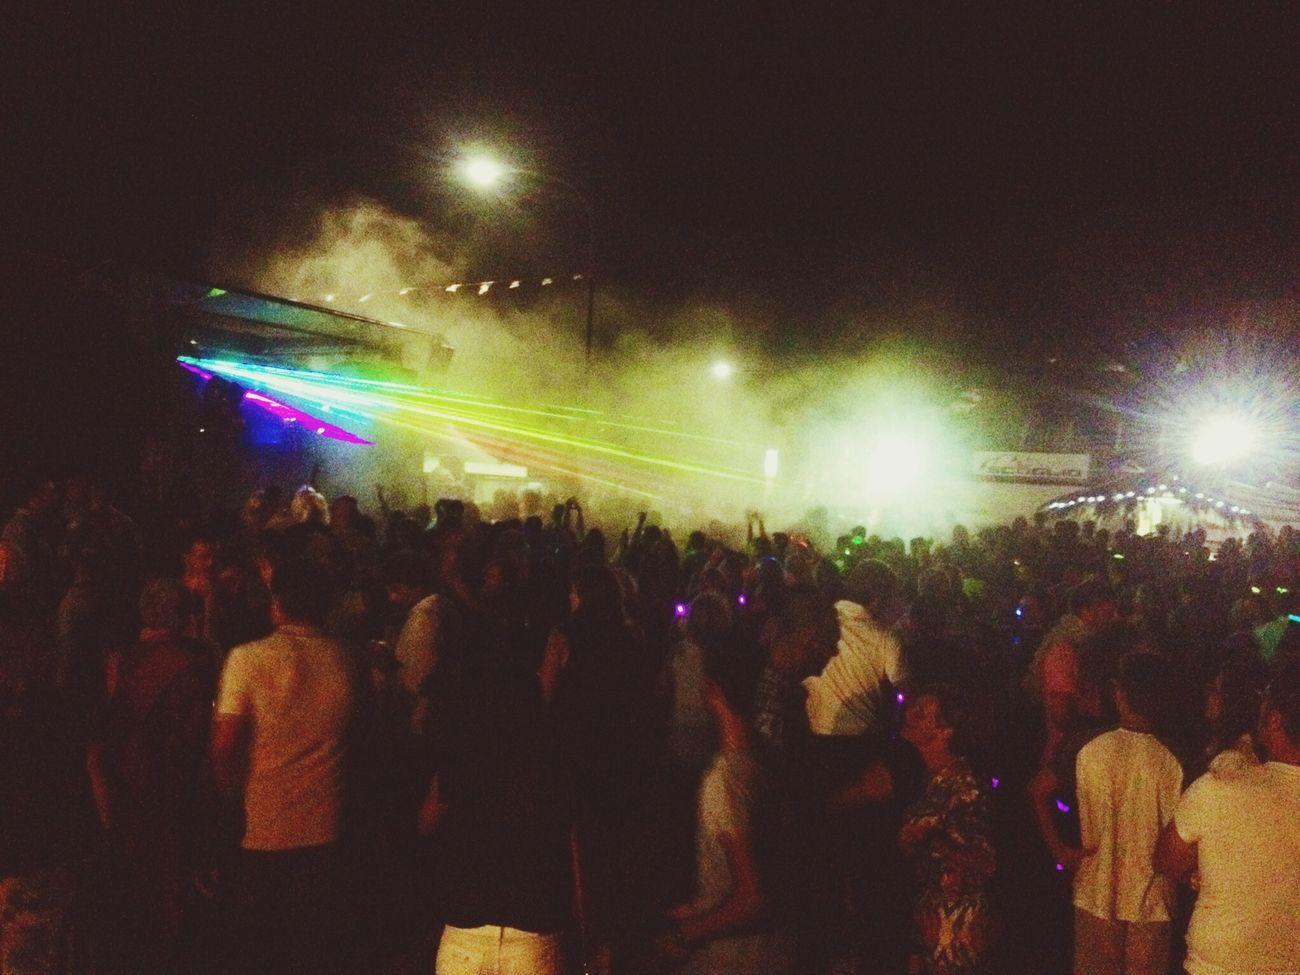 This night we feel alive! Dj Megawatt beach party <3 Beach Party Dancing Dj Megawatt Night